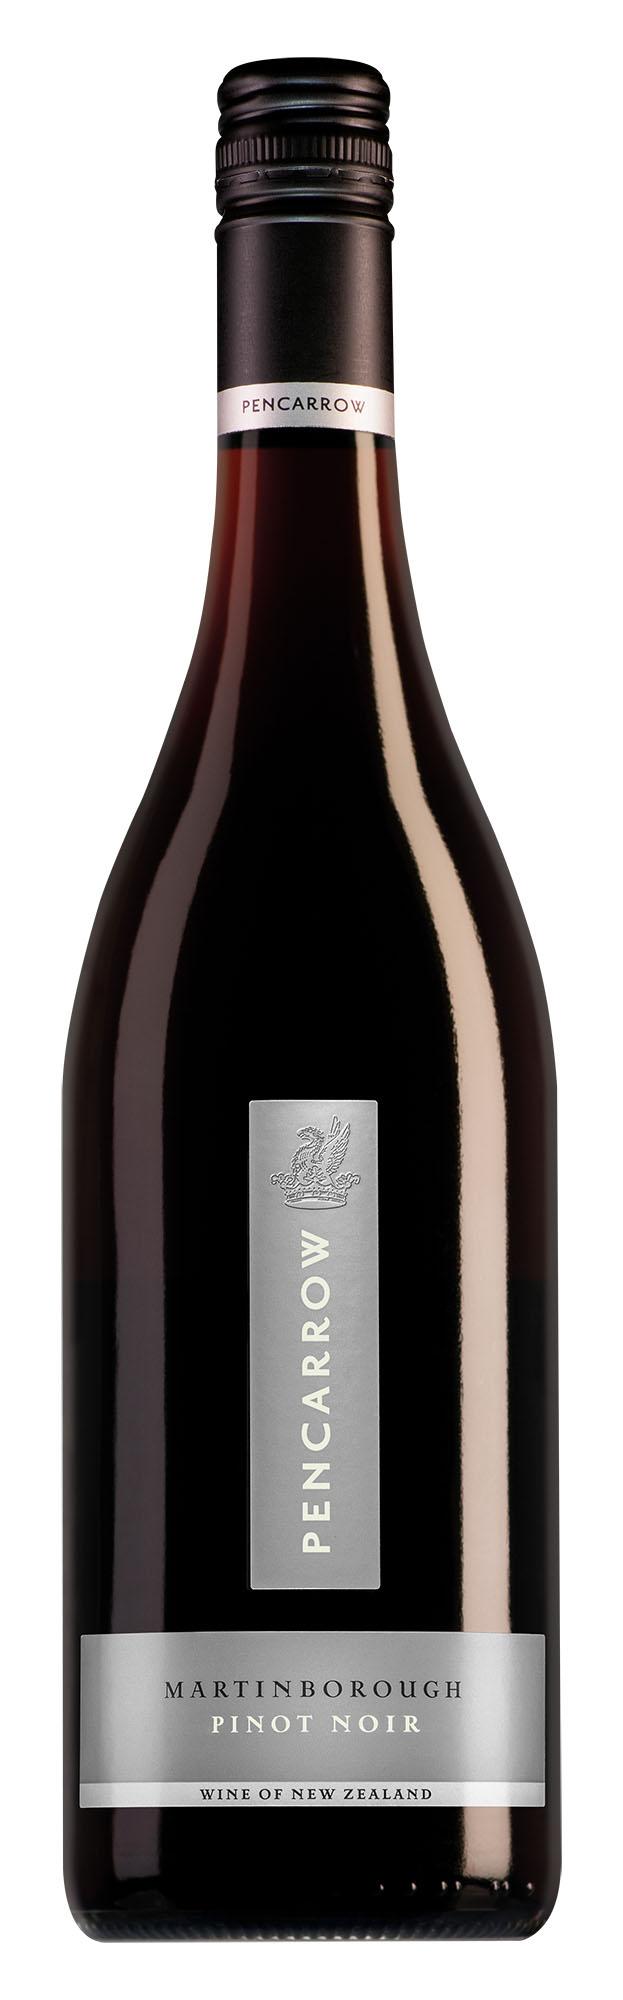 Palliser Estate Martinborough Pencarrow Pinot Noir